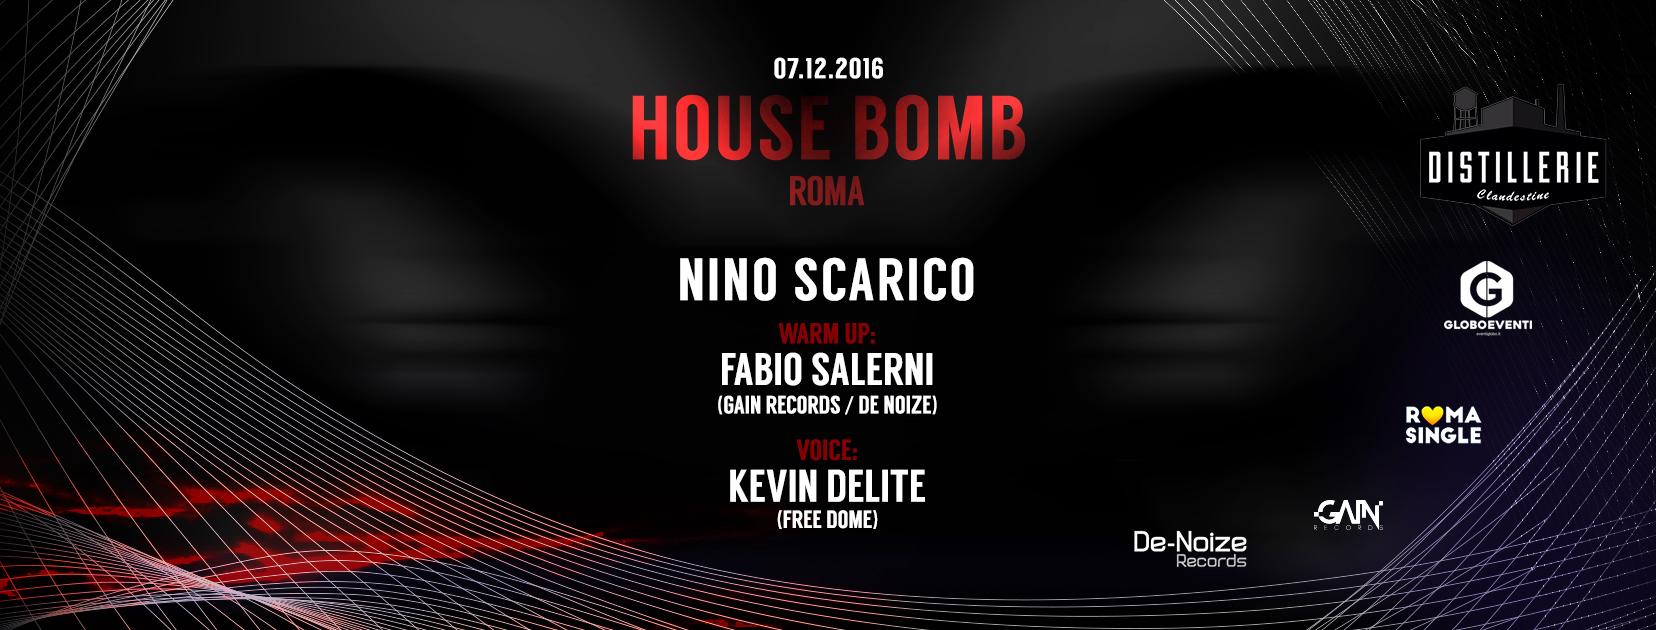 Distillerie Clandestine House Bomb Roma mercoledì 7